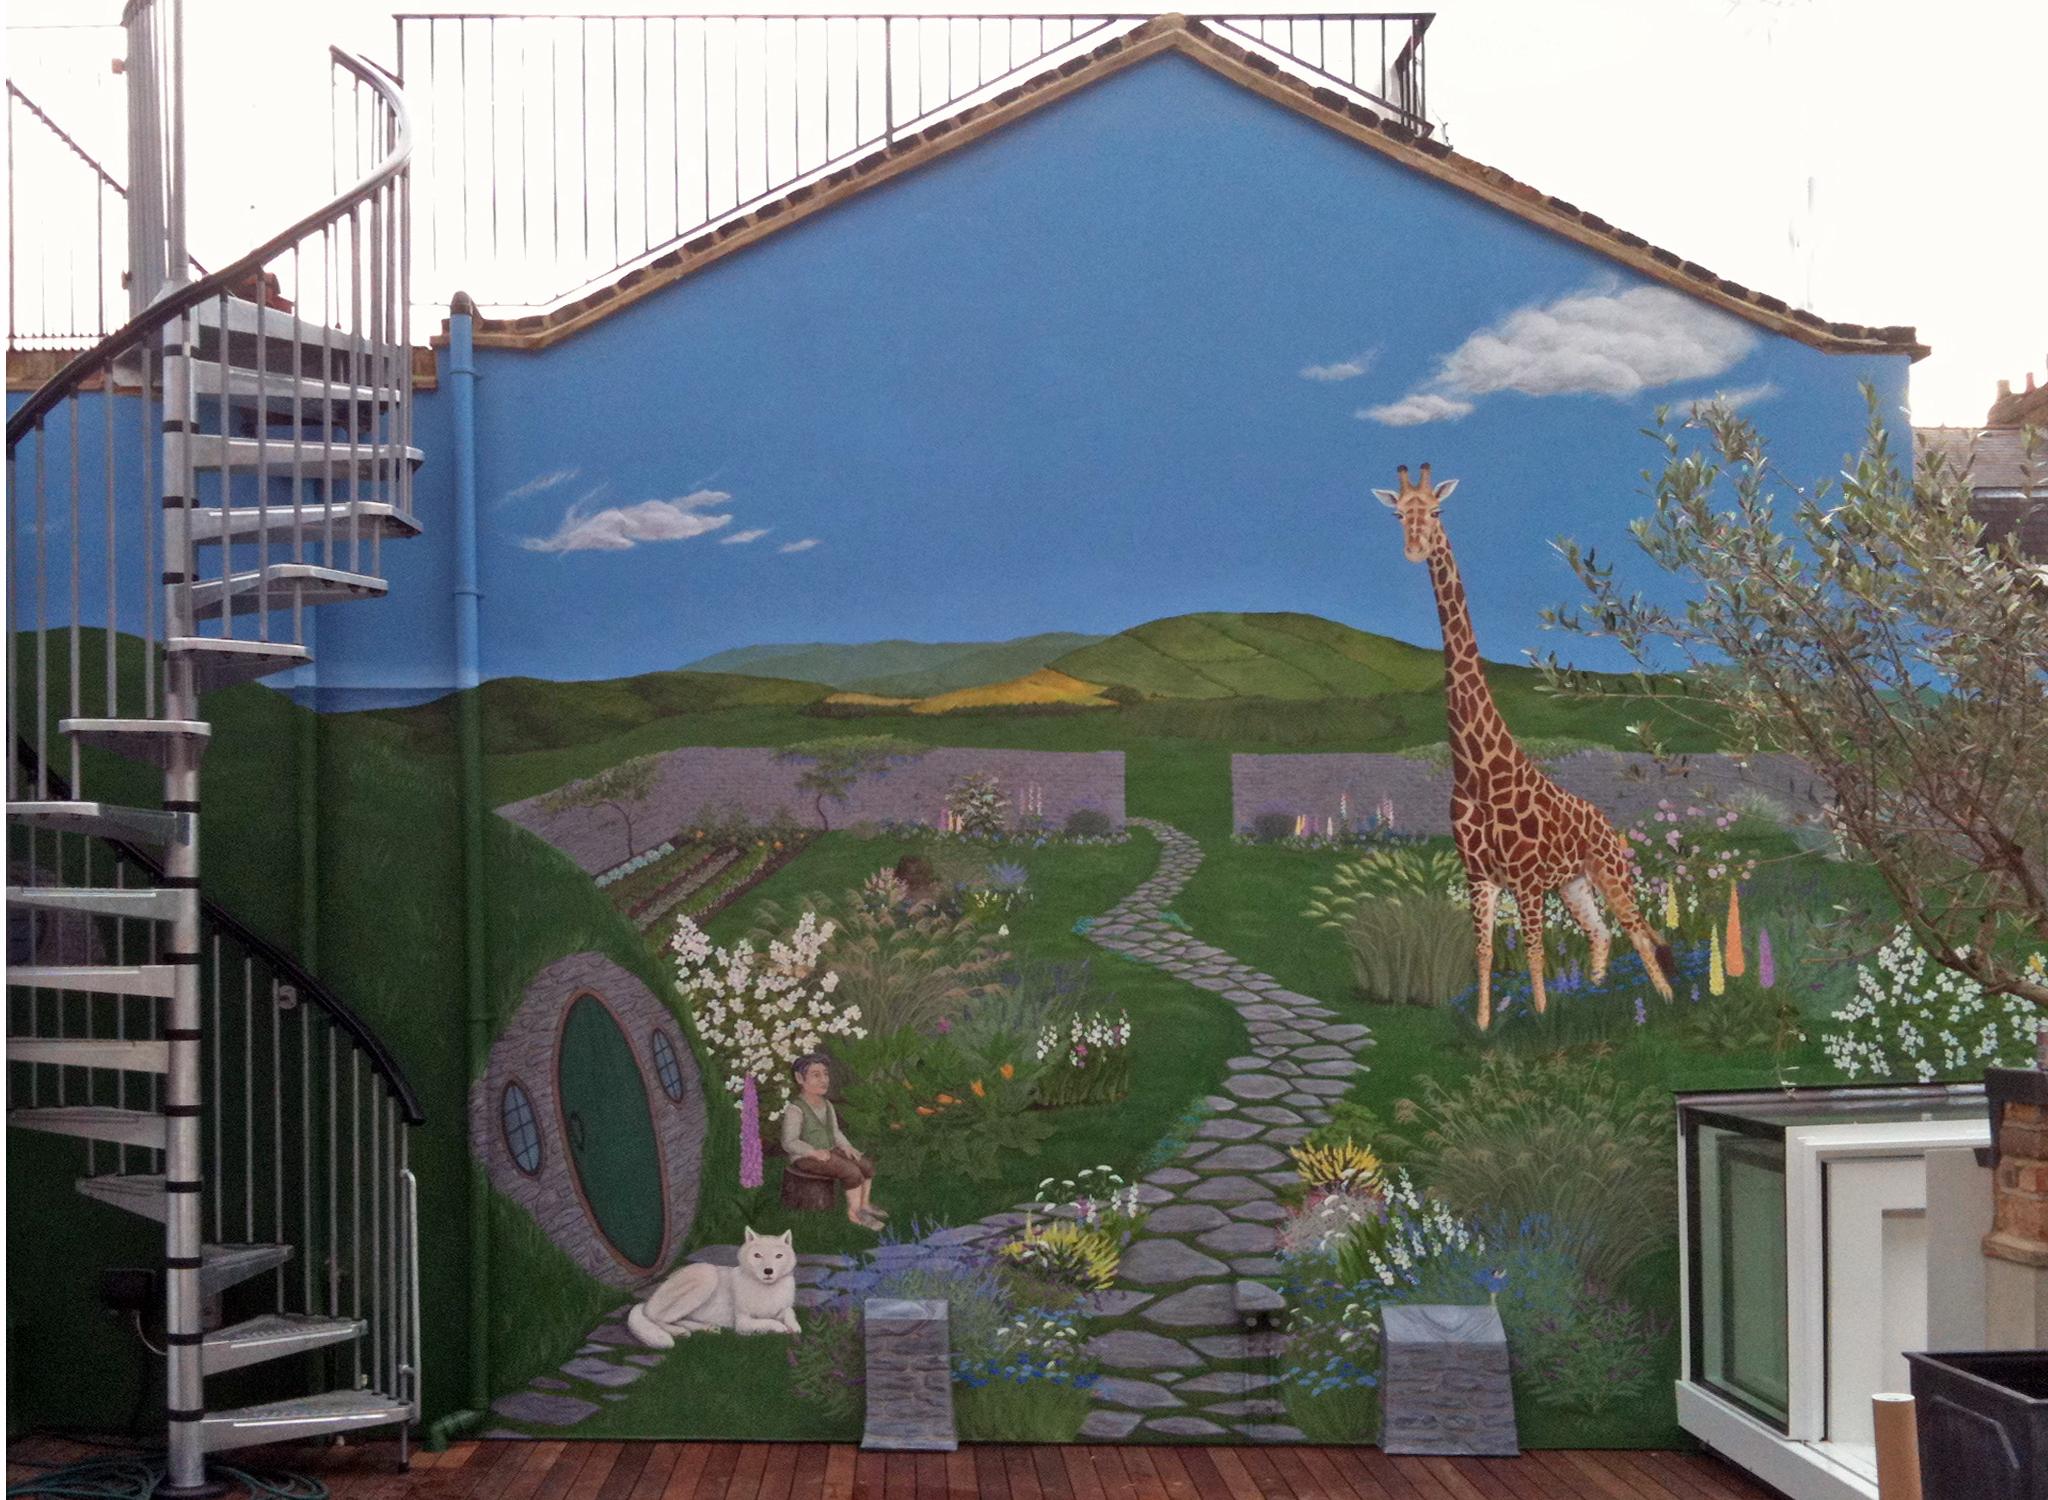 Secret Garden Frederick Wimsett - murals and artistic design - other projects1